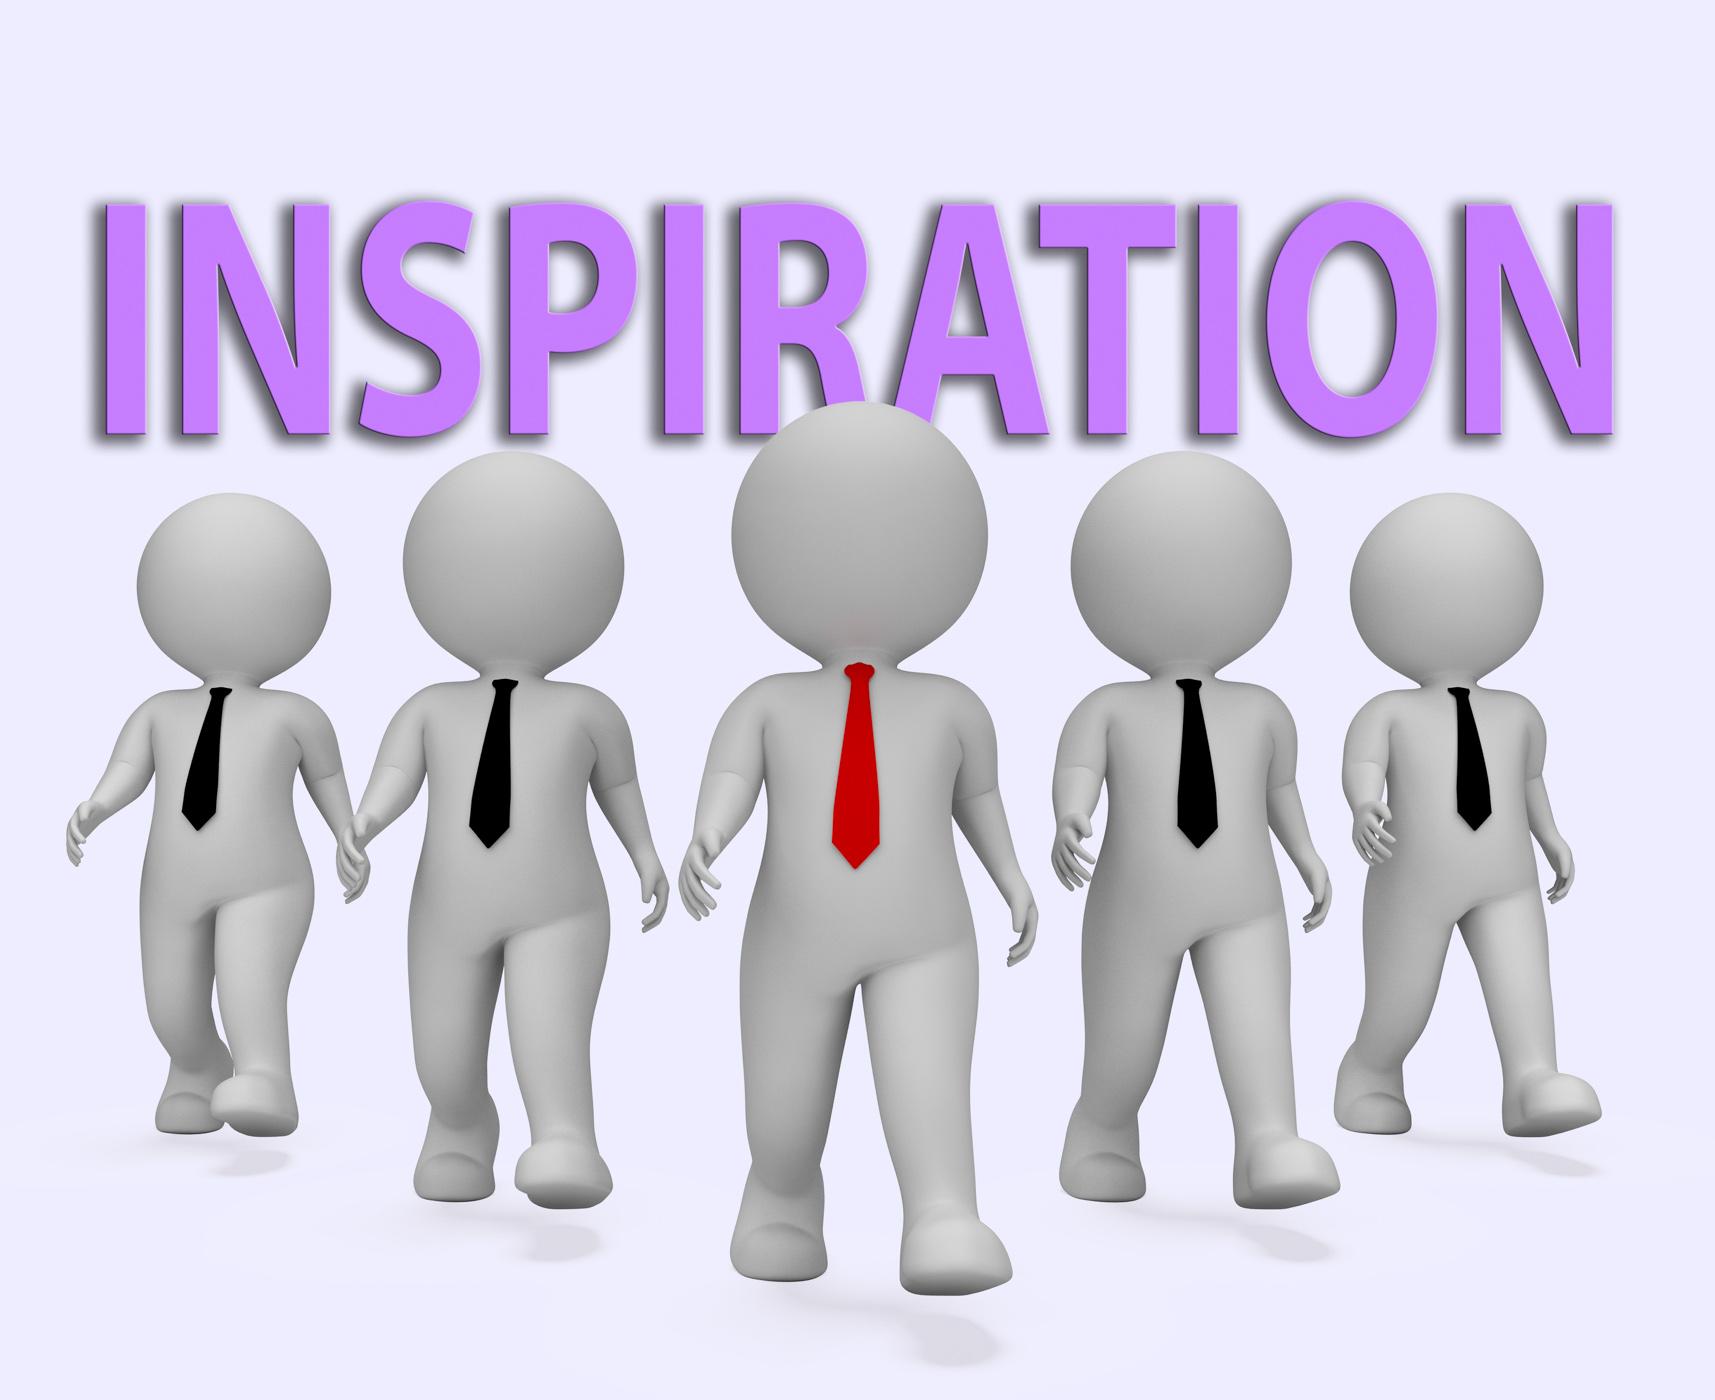 Inspiration businessmen indicates positive motivate 3d rendering photo